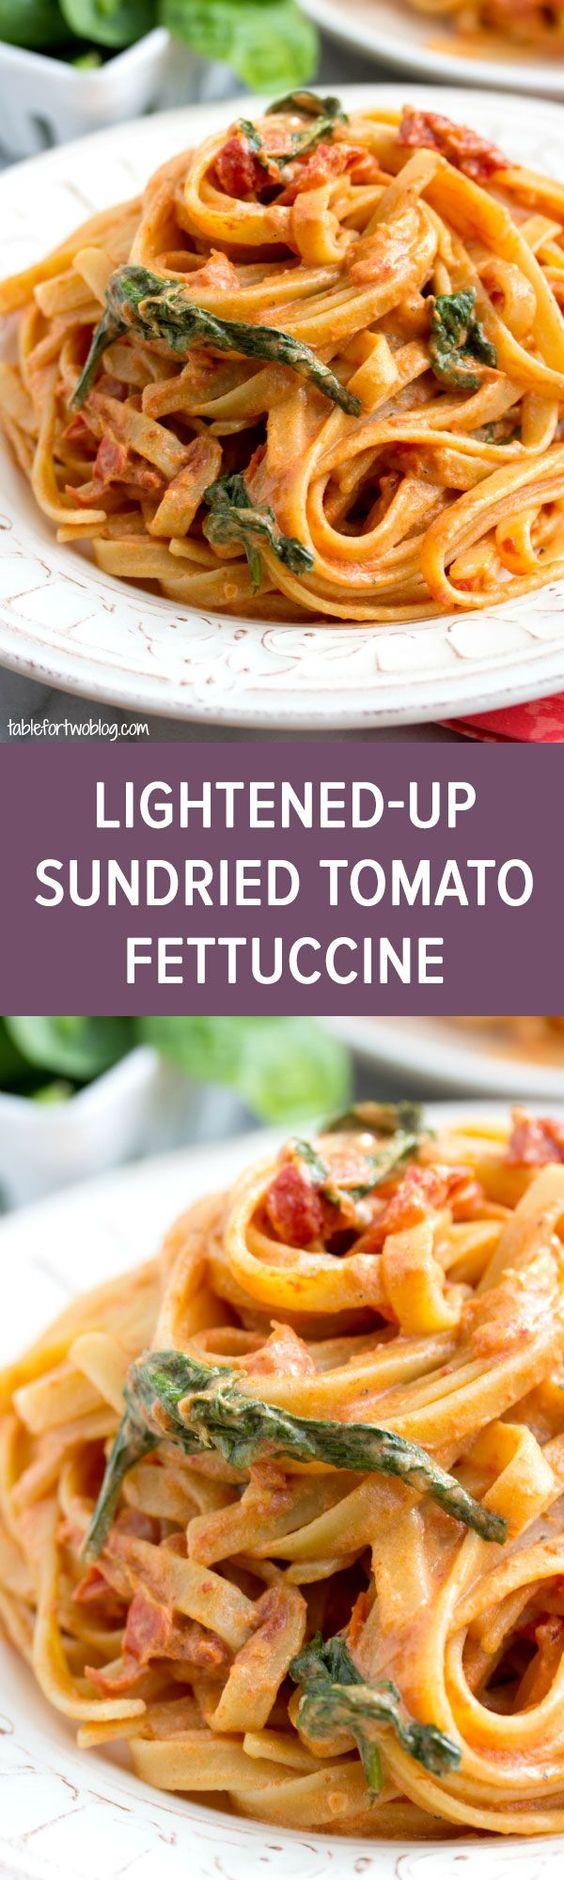 Cheesecake Factory Copycat: Sundried Tomato Fettuccine [Lightened Up] via tablefortwoblog.com